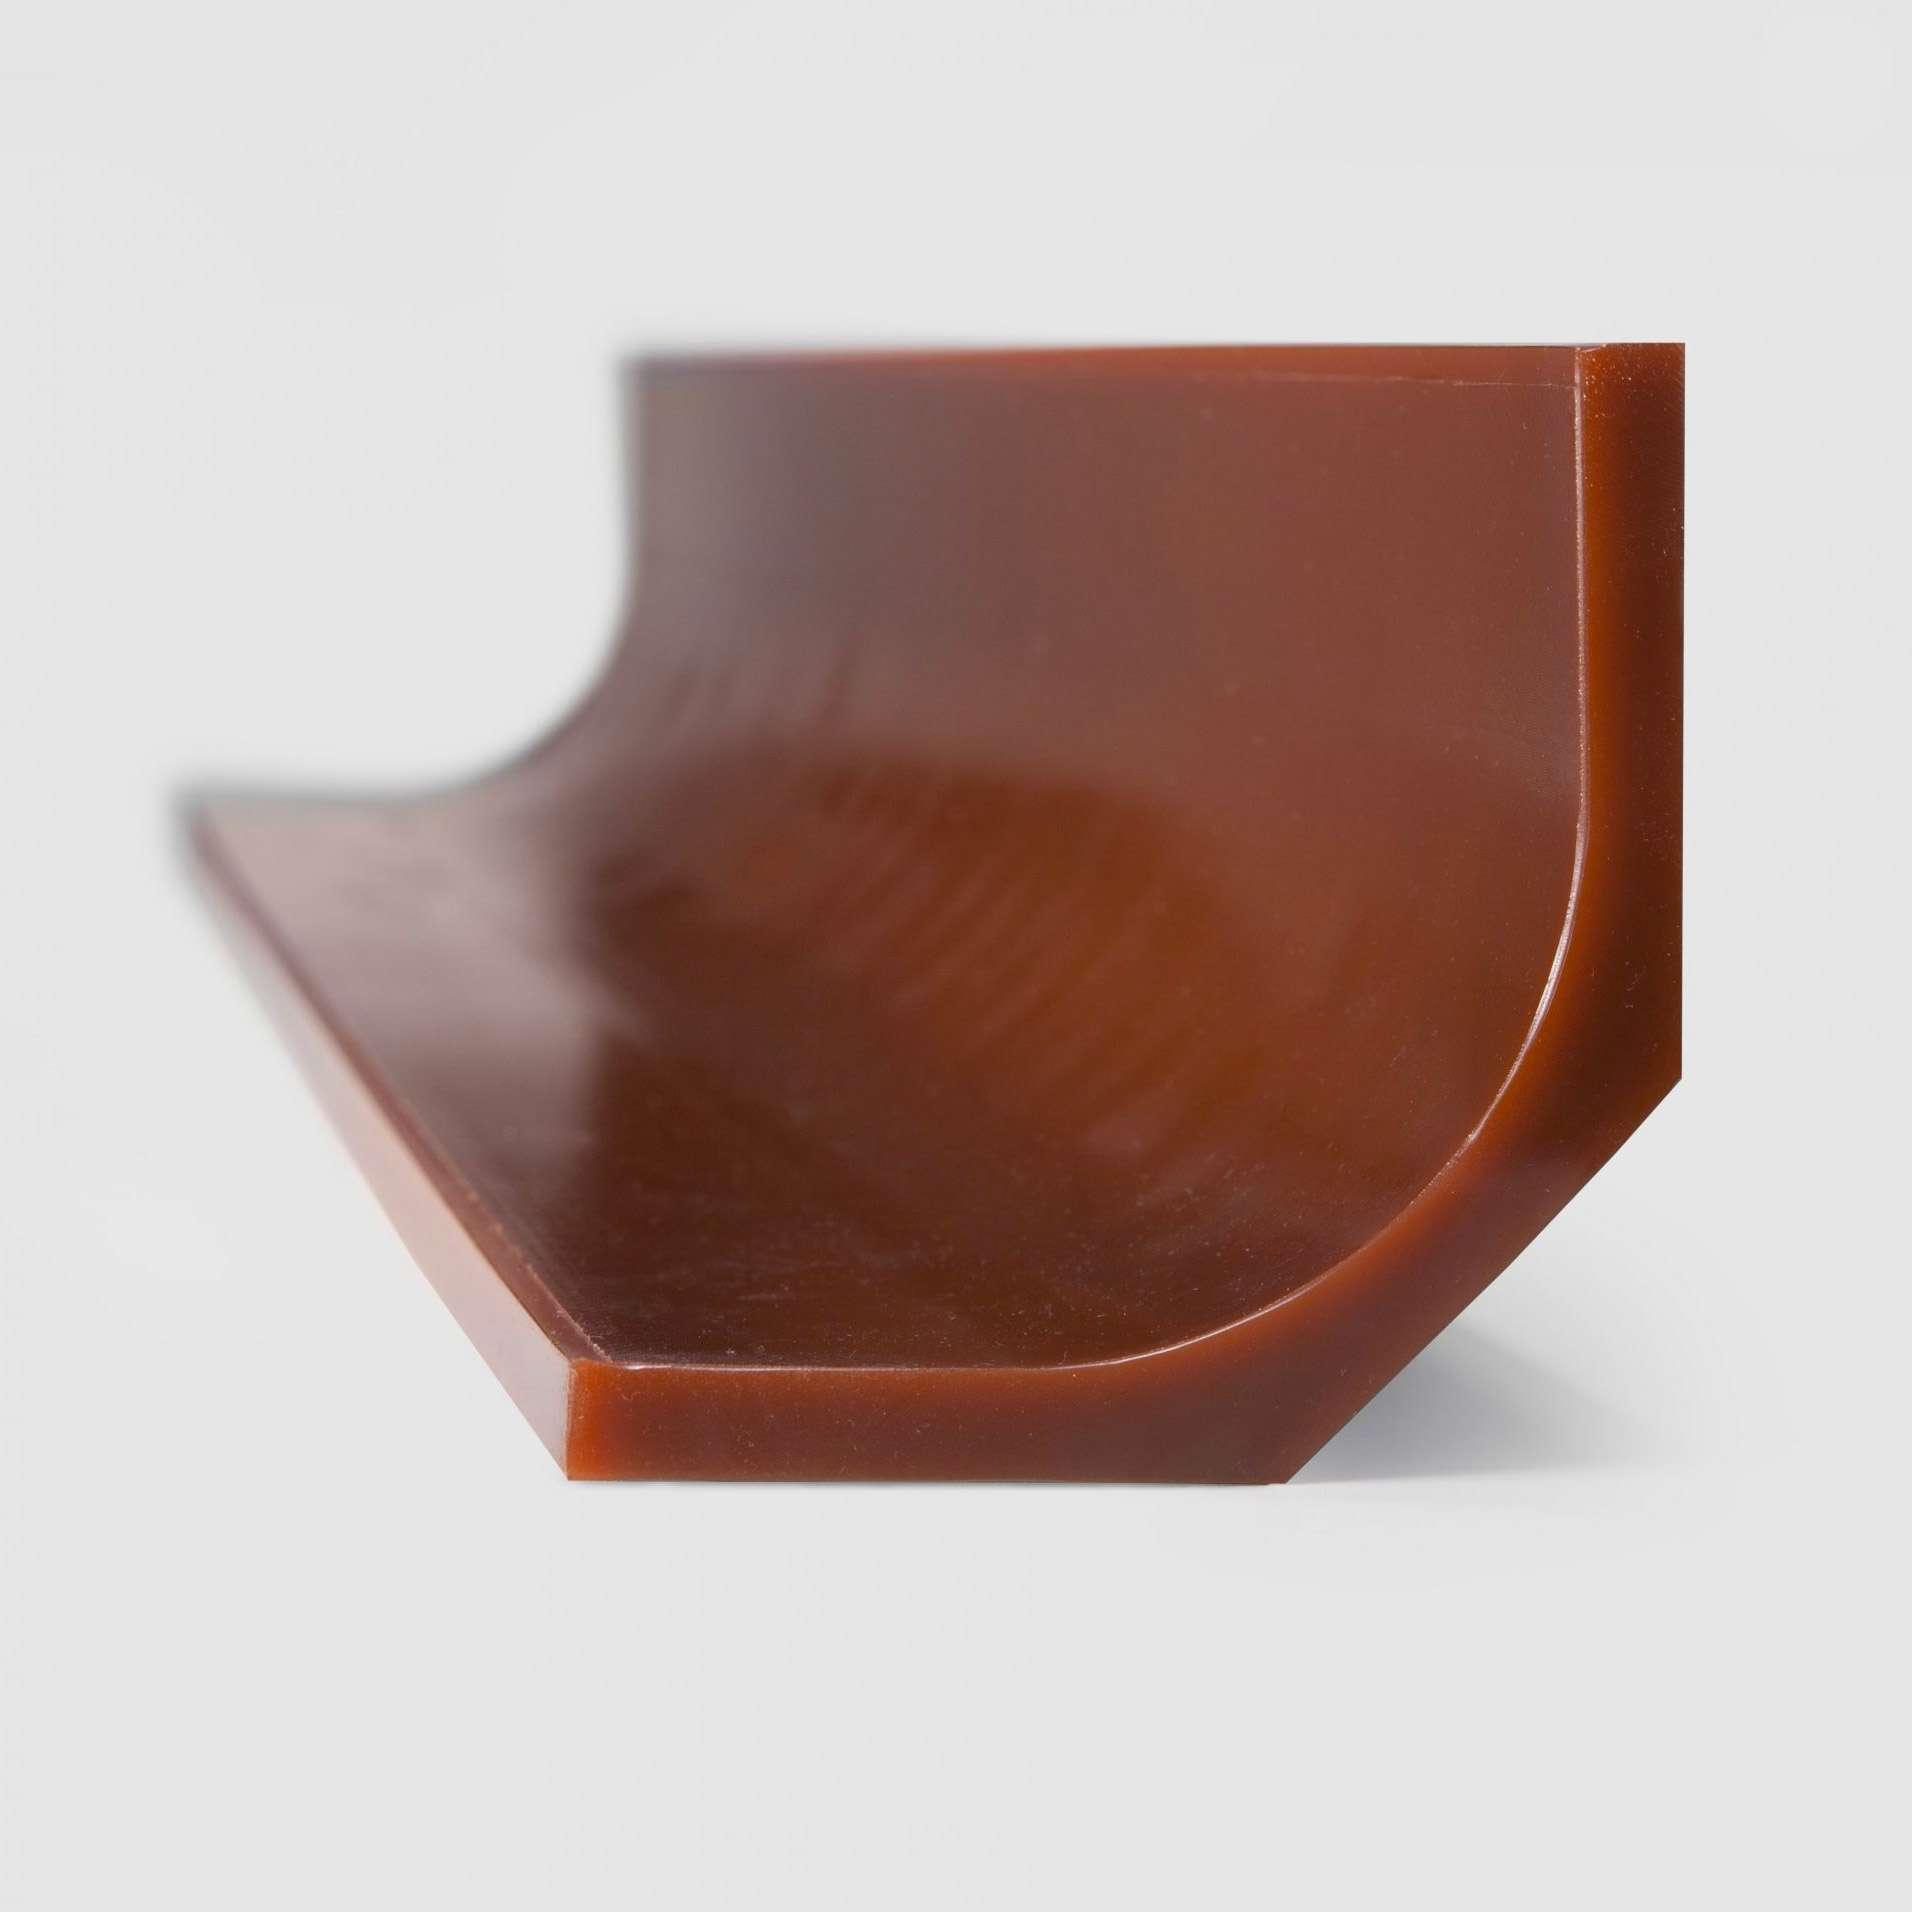 Hawiflex®-Eckenbogen / Hawiflex® corner curve